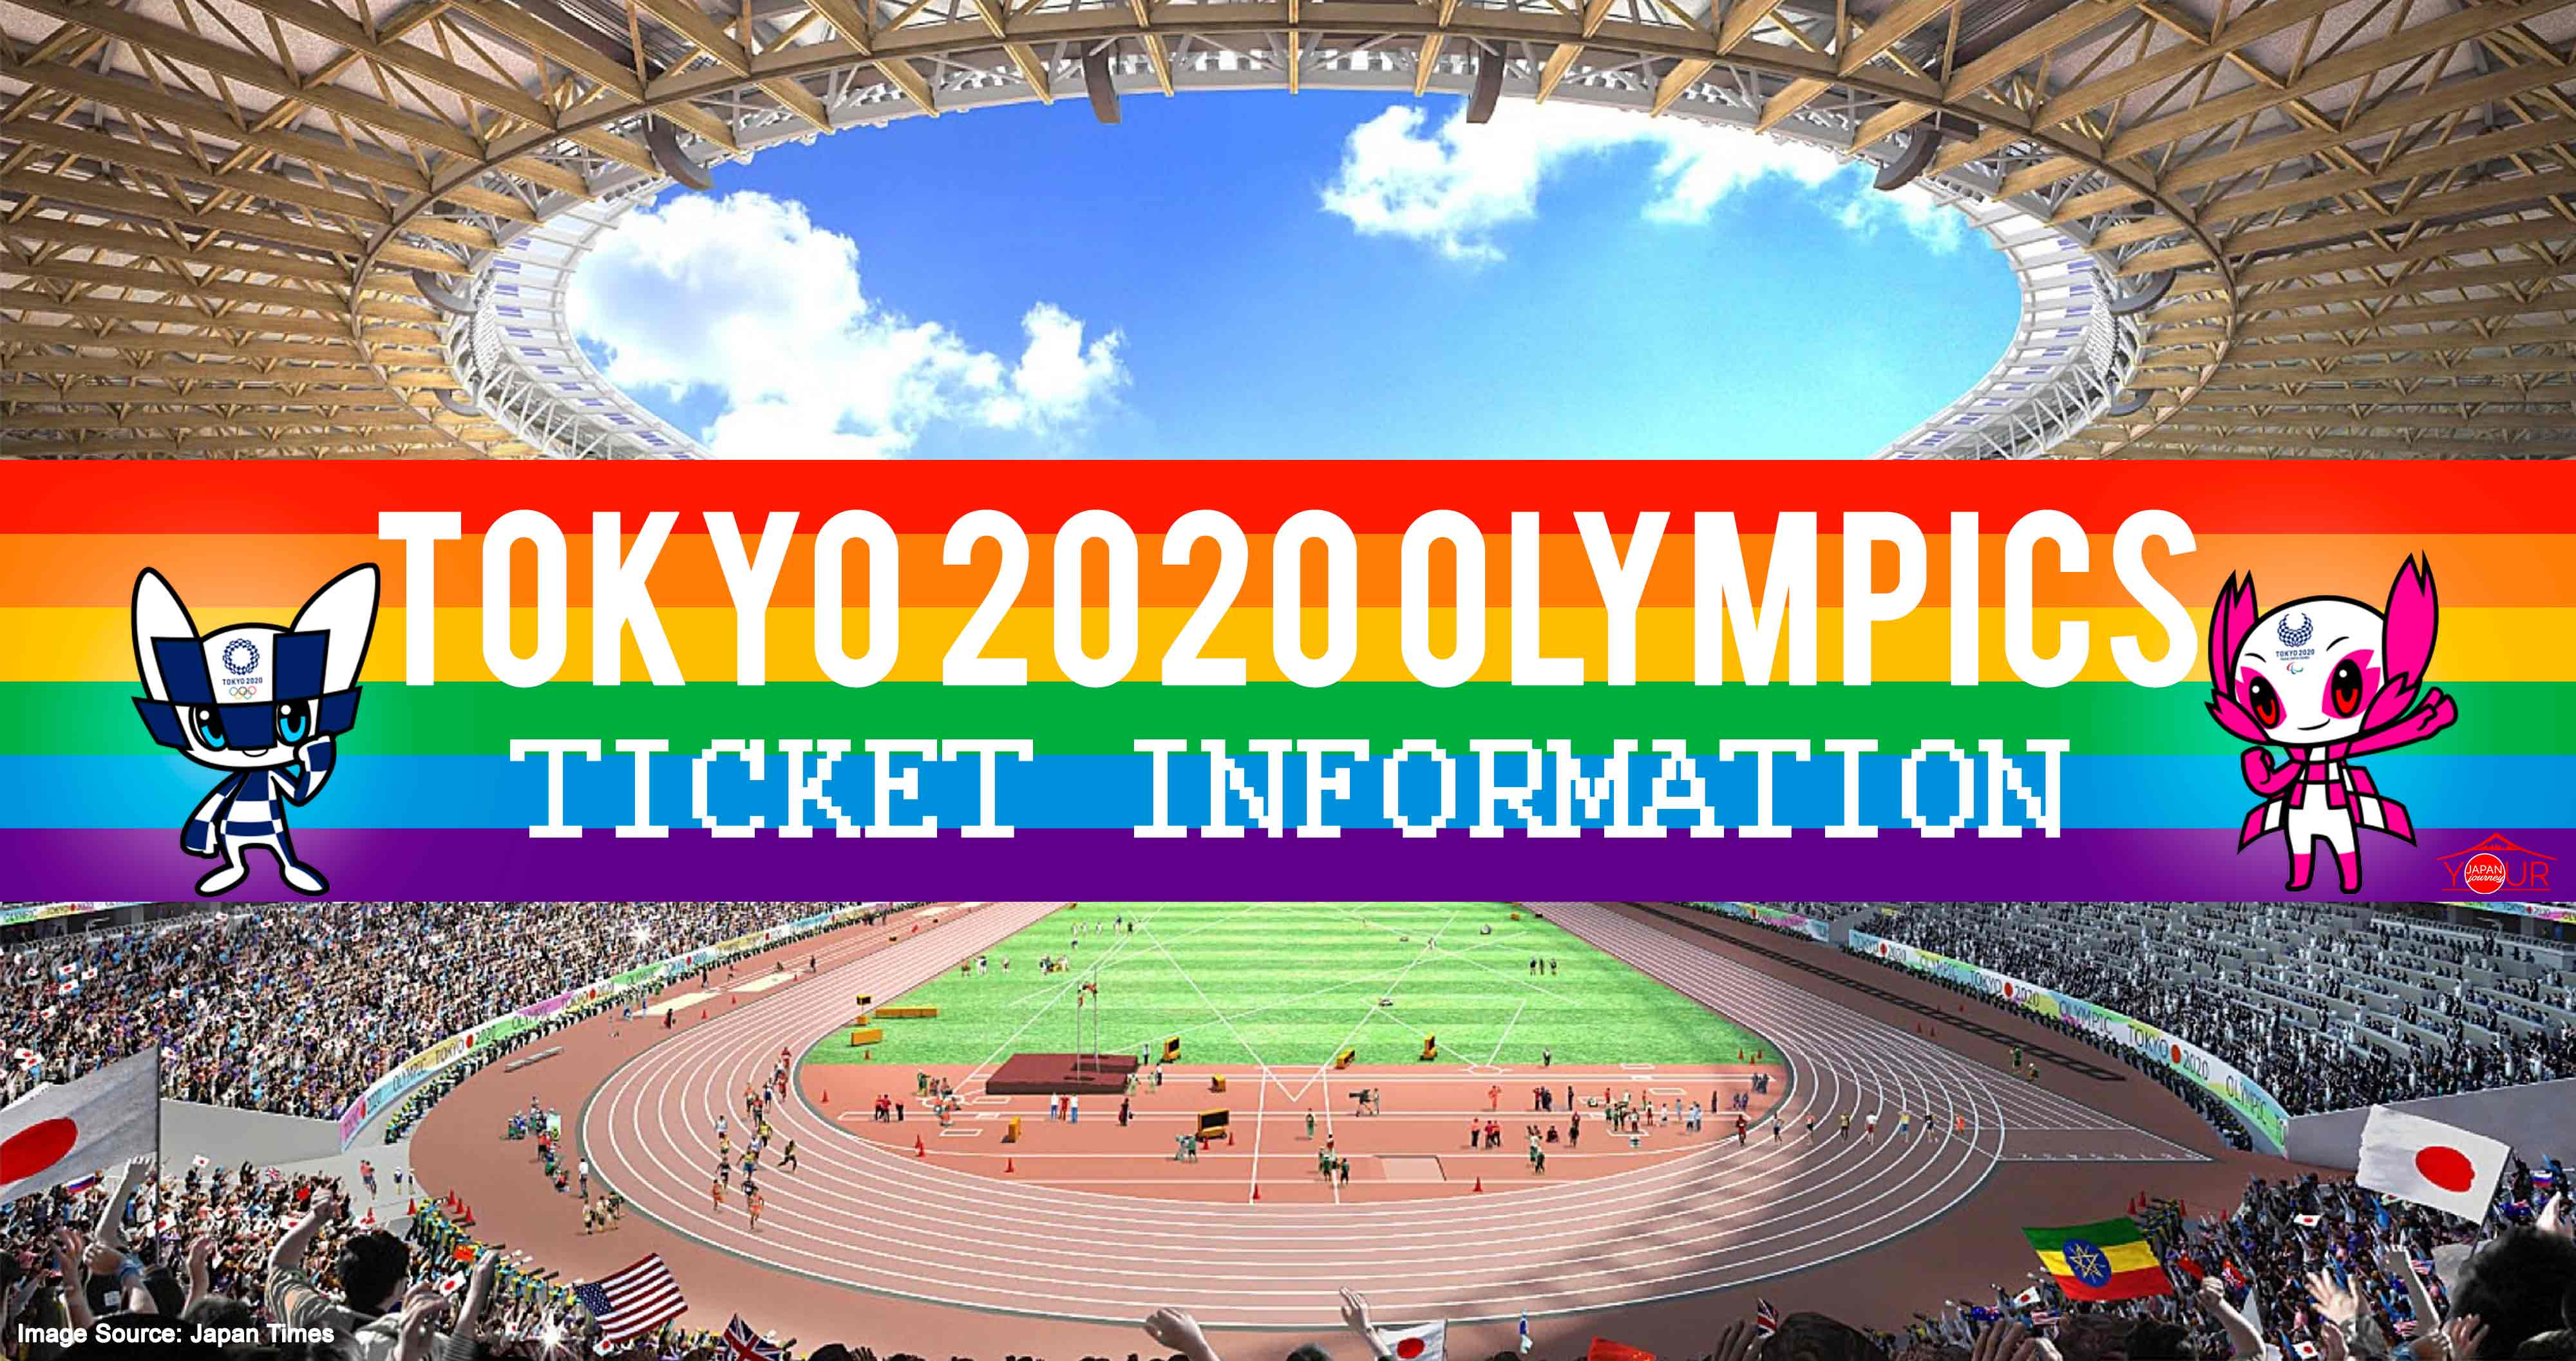 Tokyo 2020 Olympics Ticket Information